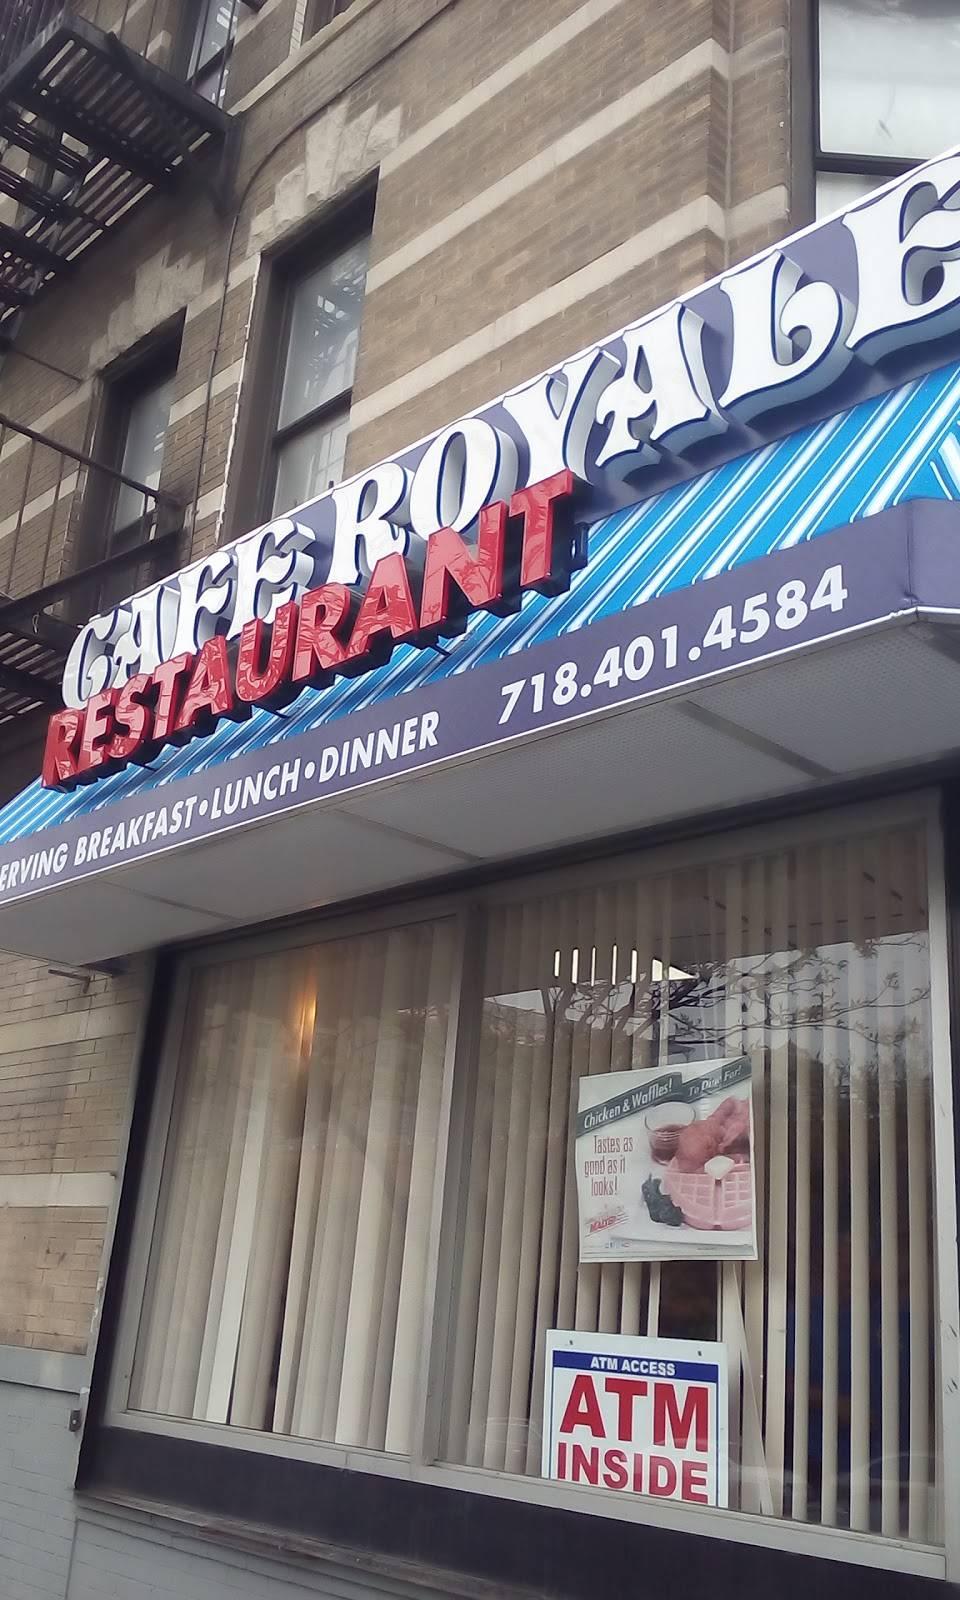 Cafe Royale | restaurant | 135 E 149th St, Bronx, NY 10451, USA | 7184014684 OR +1 718-401-4684